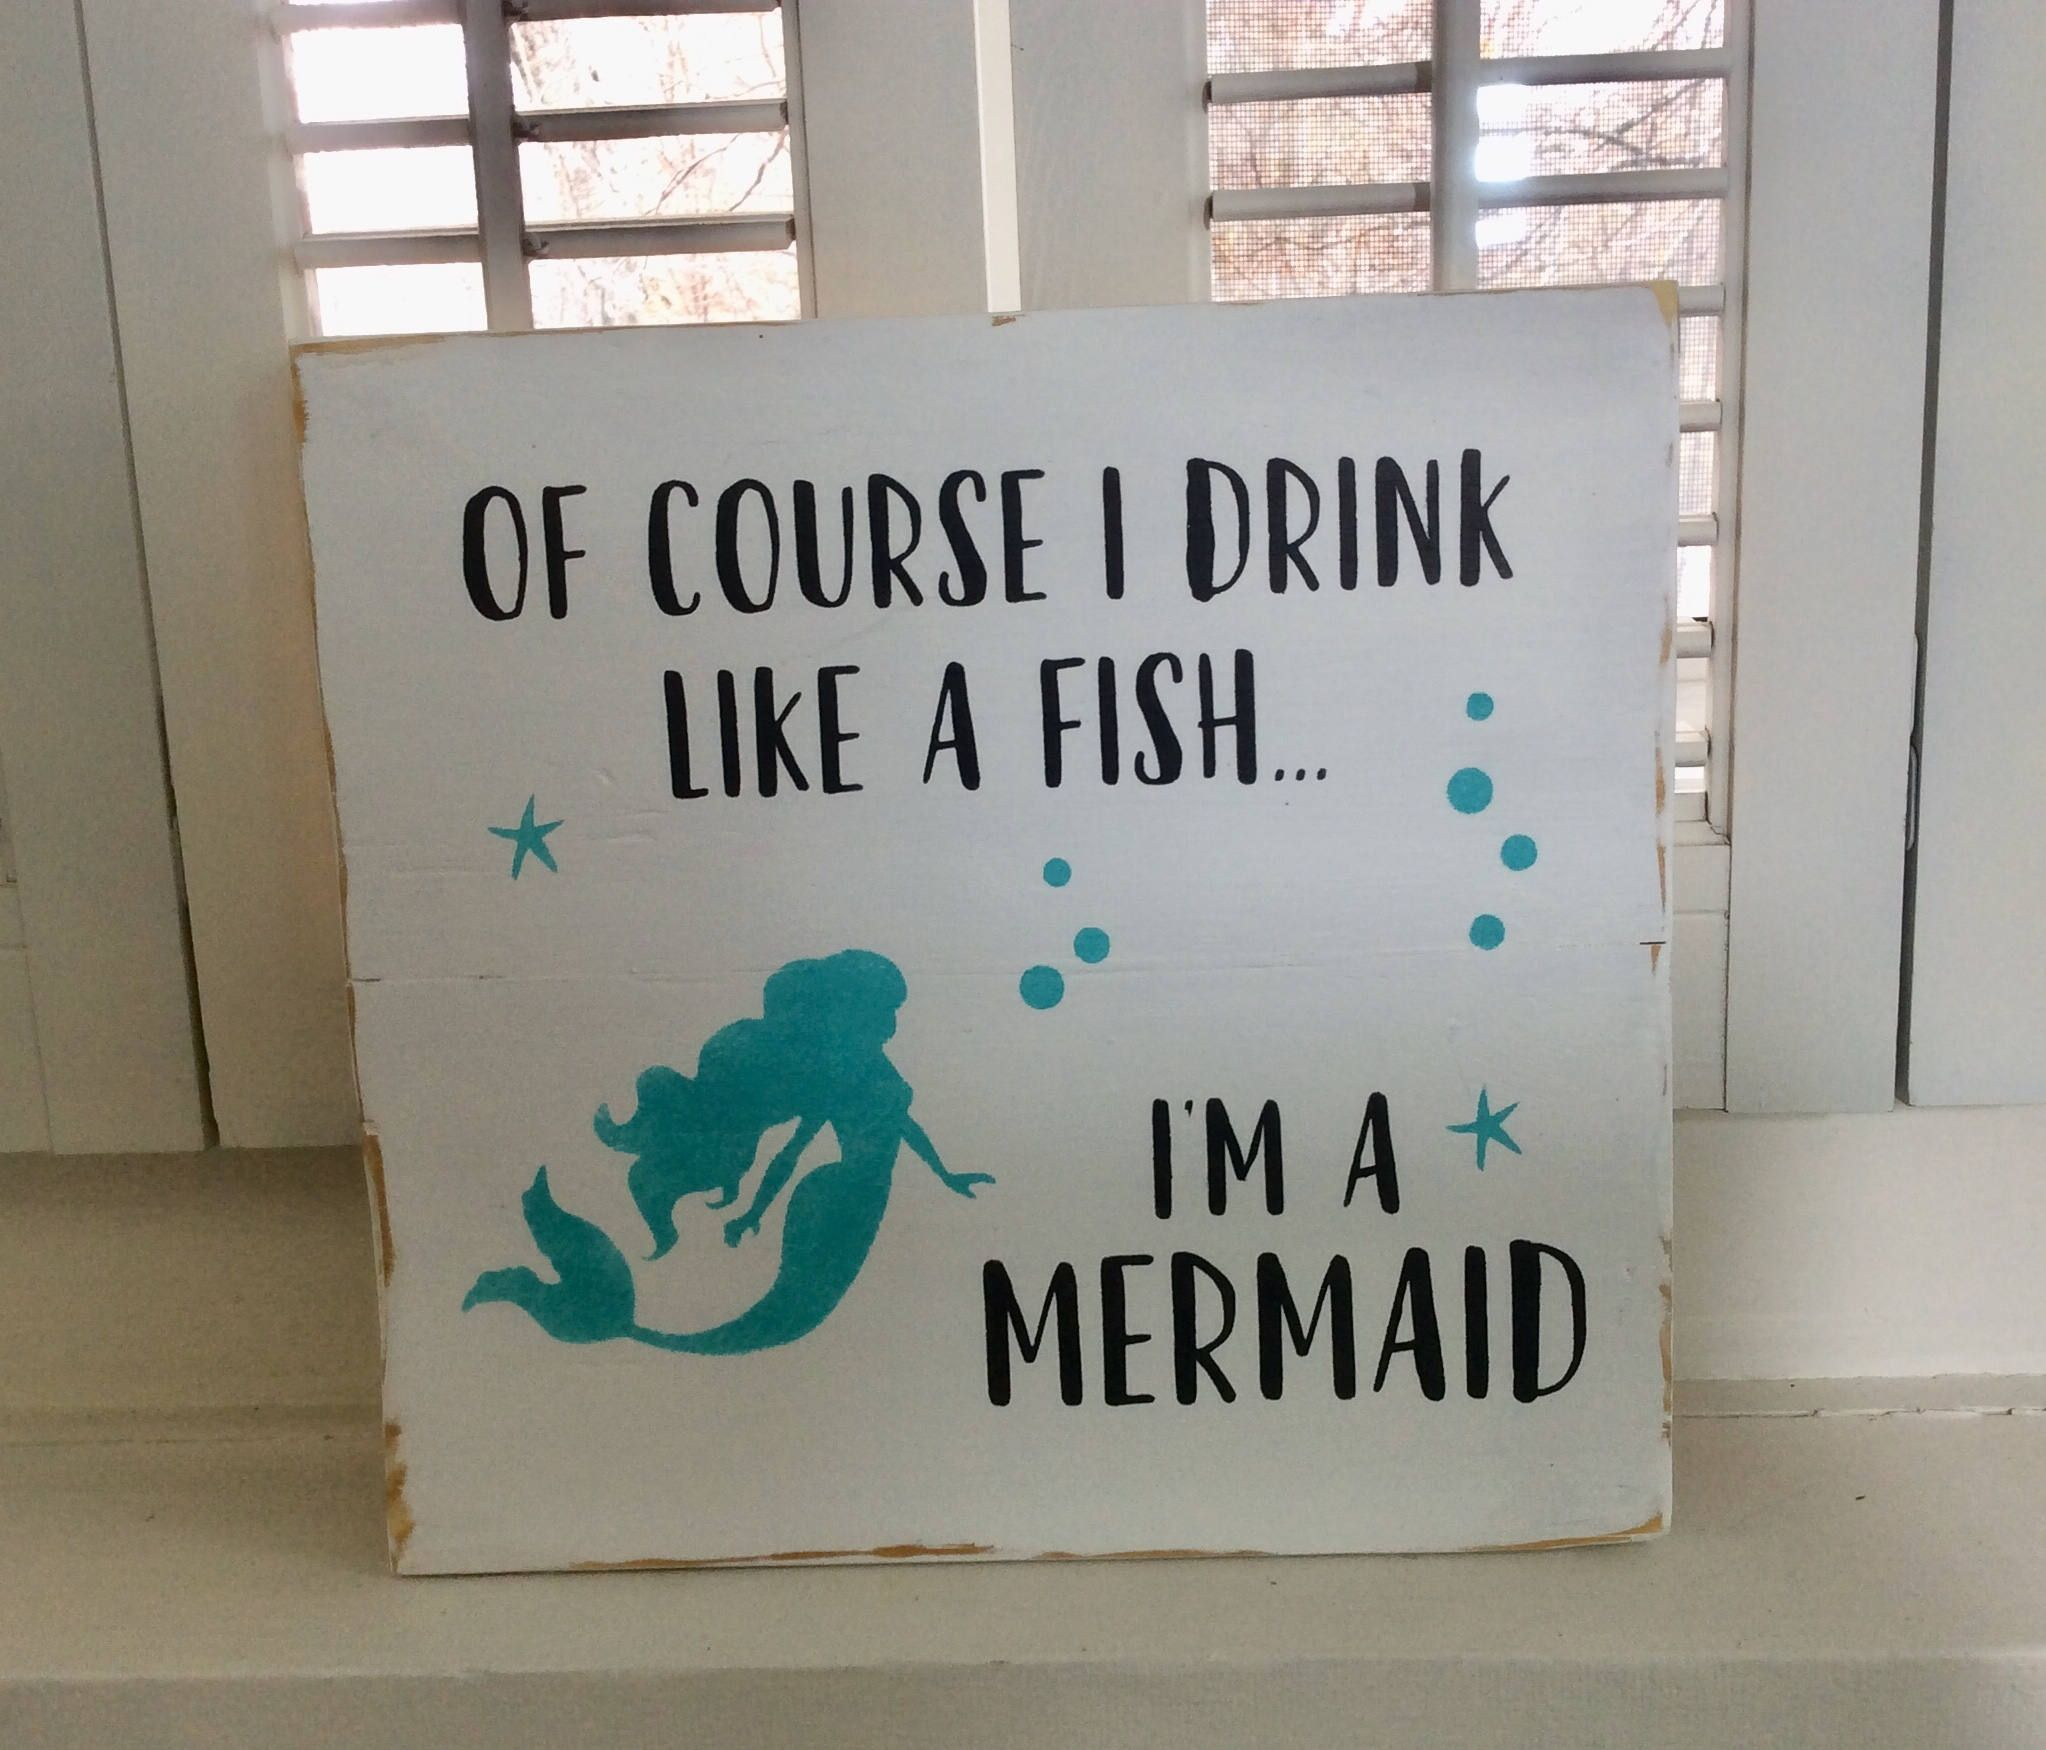 Of course I drink like a fish I'm a Mermaid wood pallet sign, mermaid sign, beach decor, bar sign, girlfriend gift, lanai decor #mermaidsign